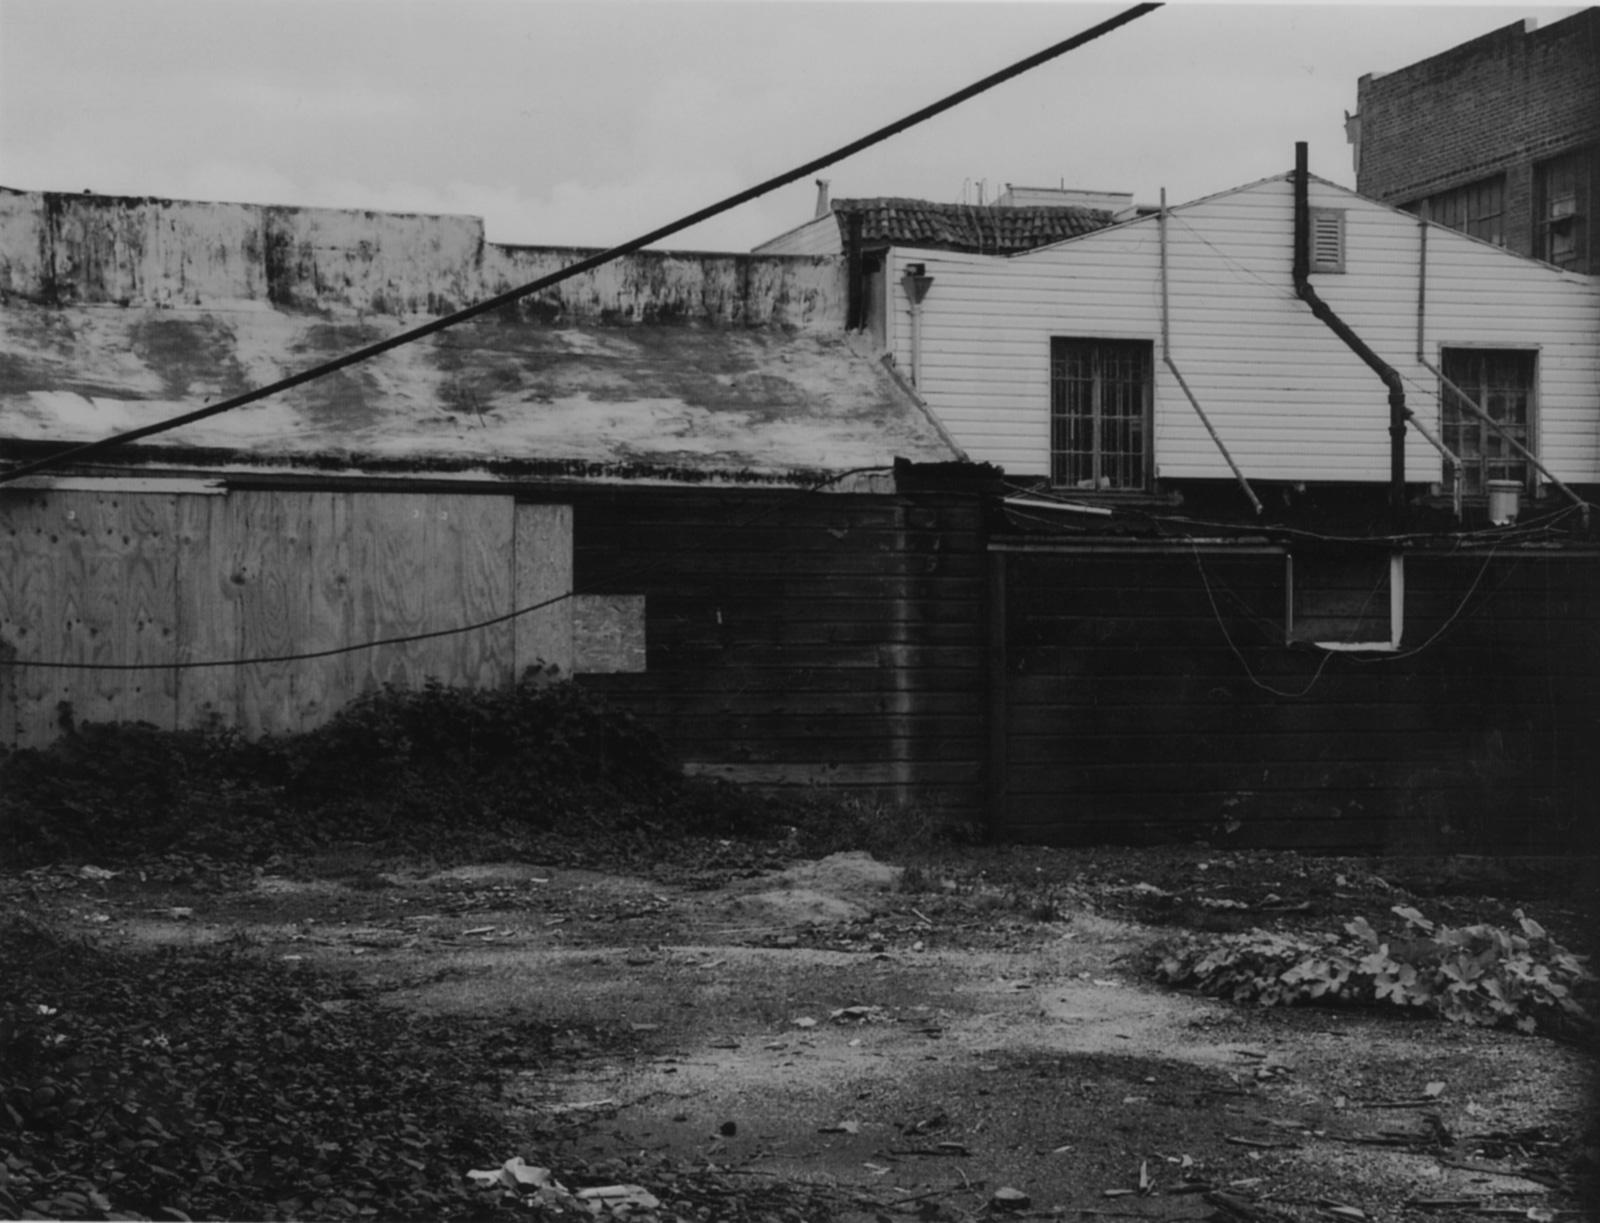 San Carlos Ave Shacks, Abandoned, Bspo06, Building, B&w, HQ Photo